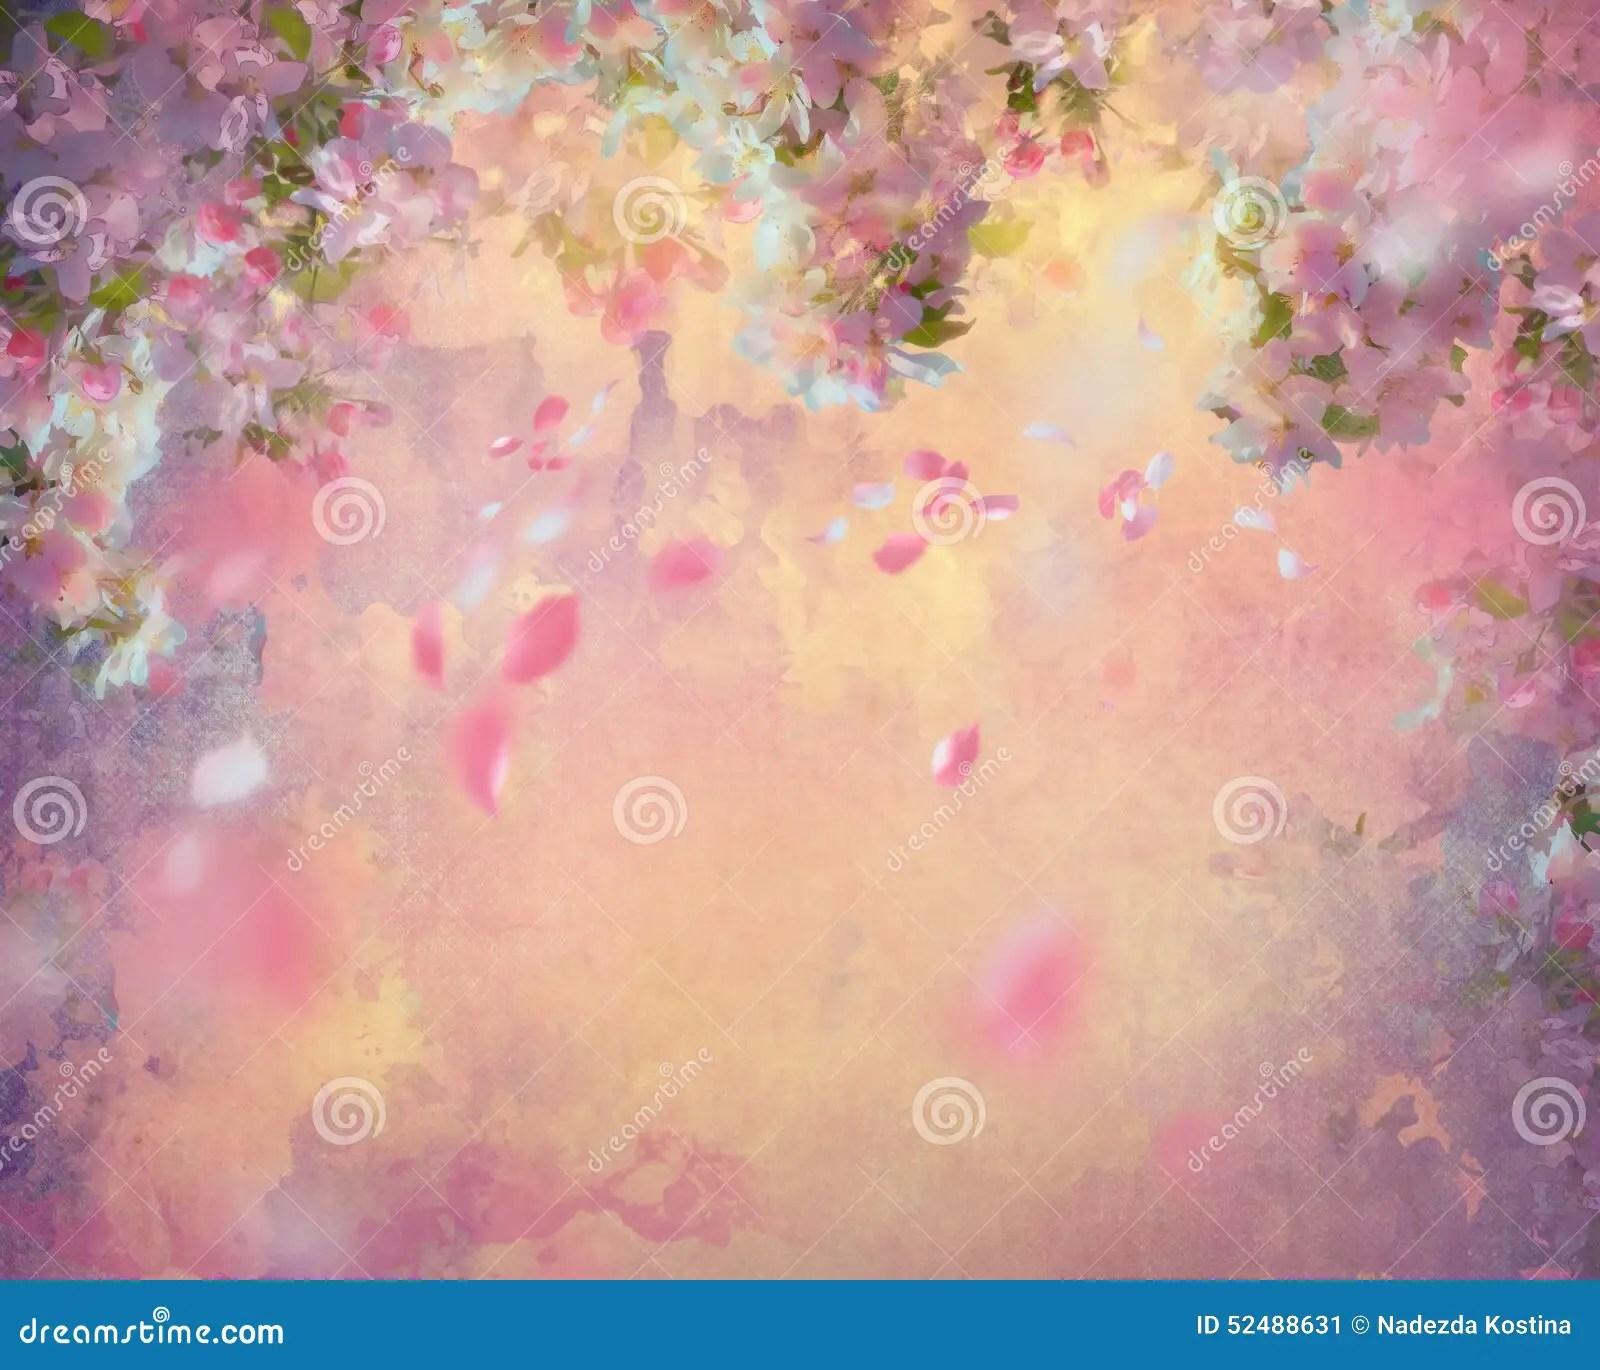 Ressort Cherry Blossom Painting Illustration Stock